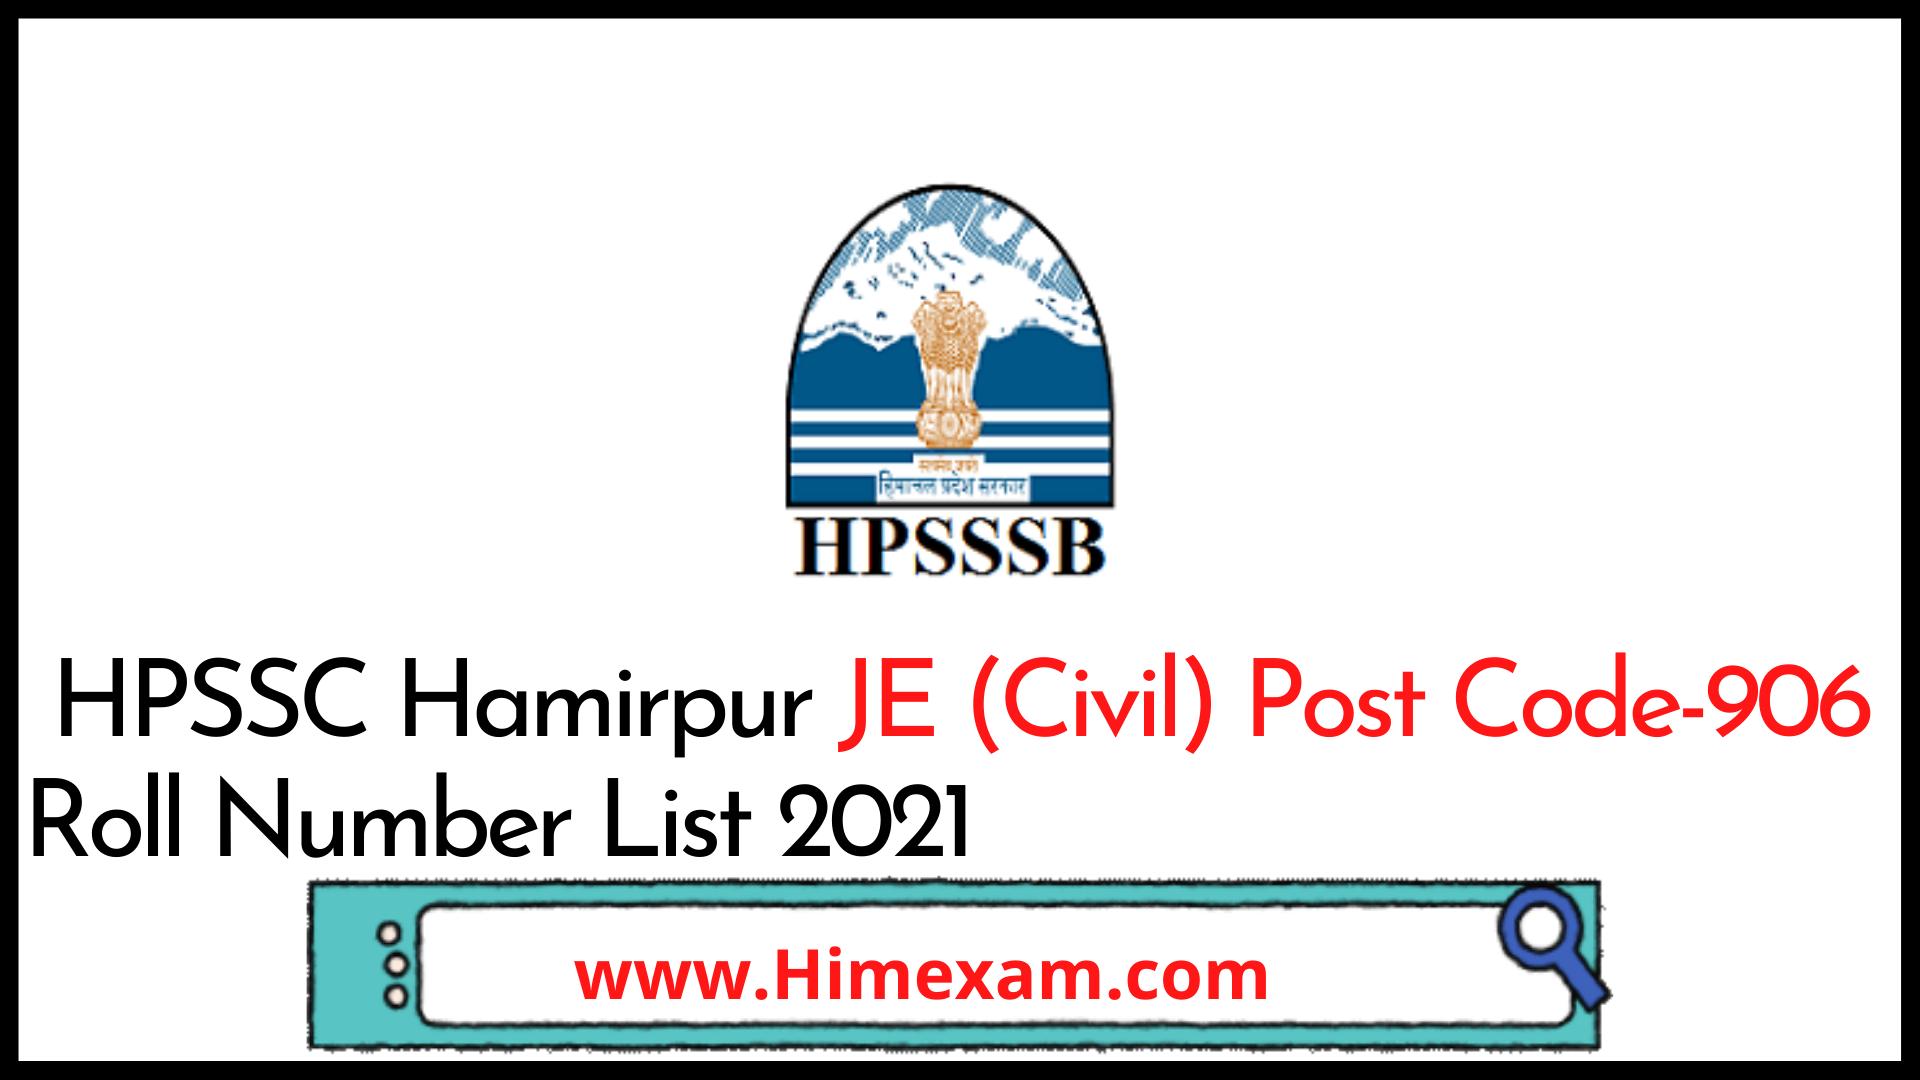 HPSSC Hamirpur JE (Civil) Post Code-906 Roll Number List 2021